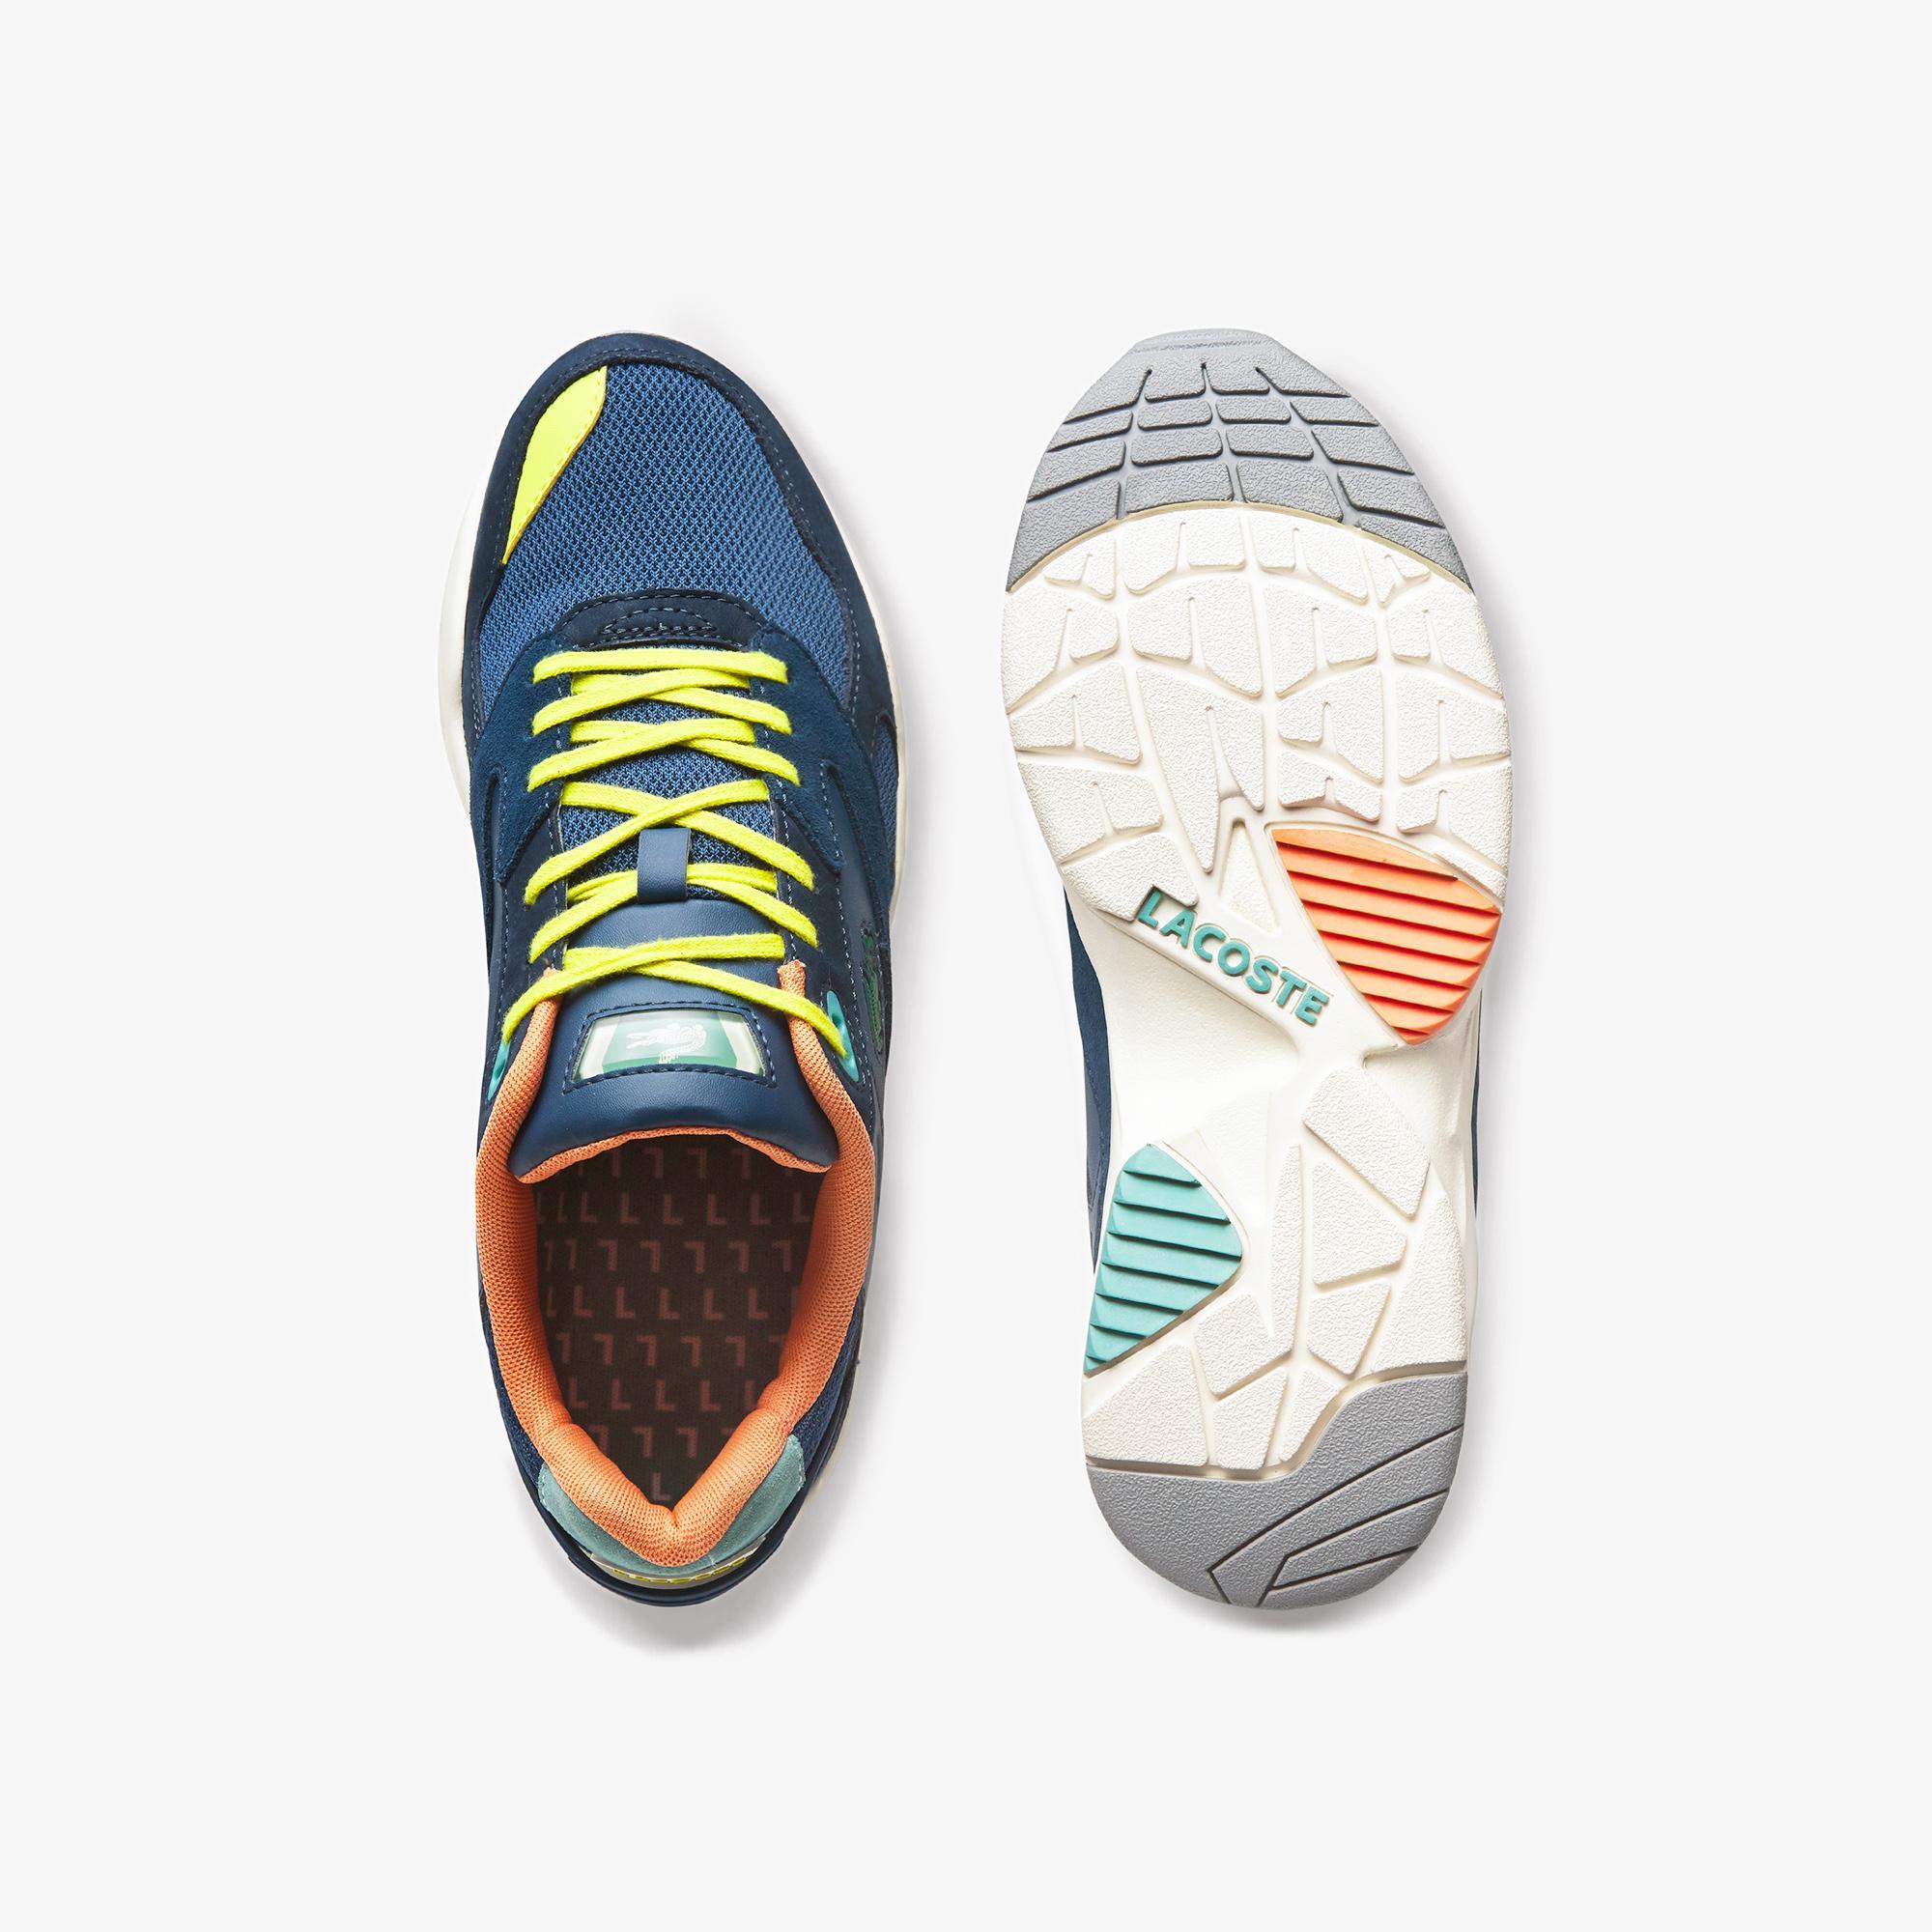 Lacoste Storm 96 Lo 0120 2 Sma Erkek Lacivert - Turkuvaz Sneaker